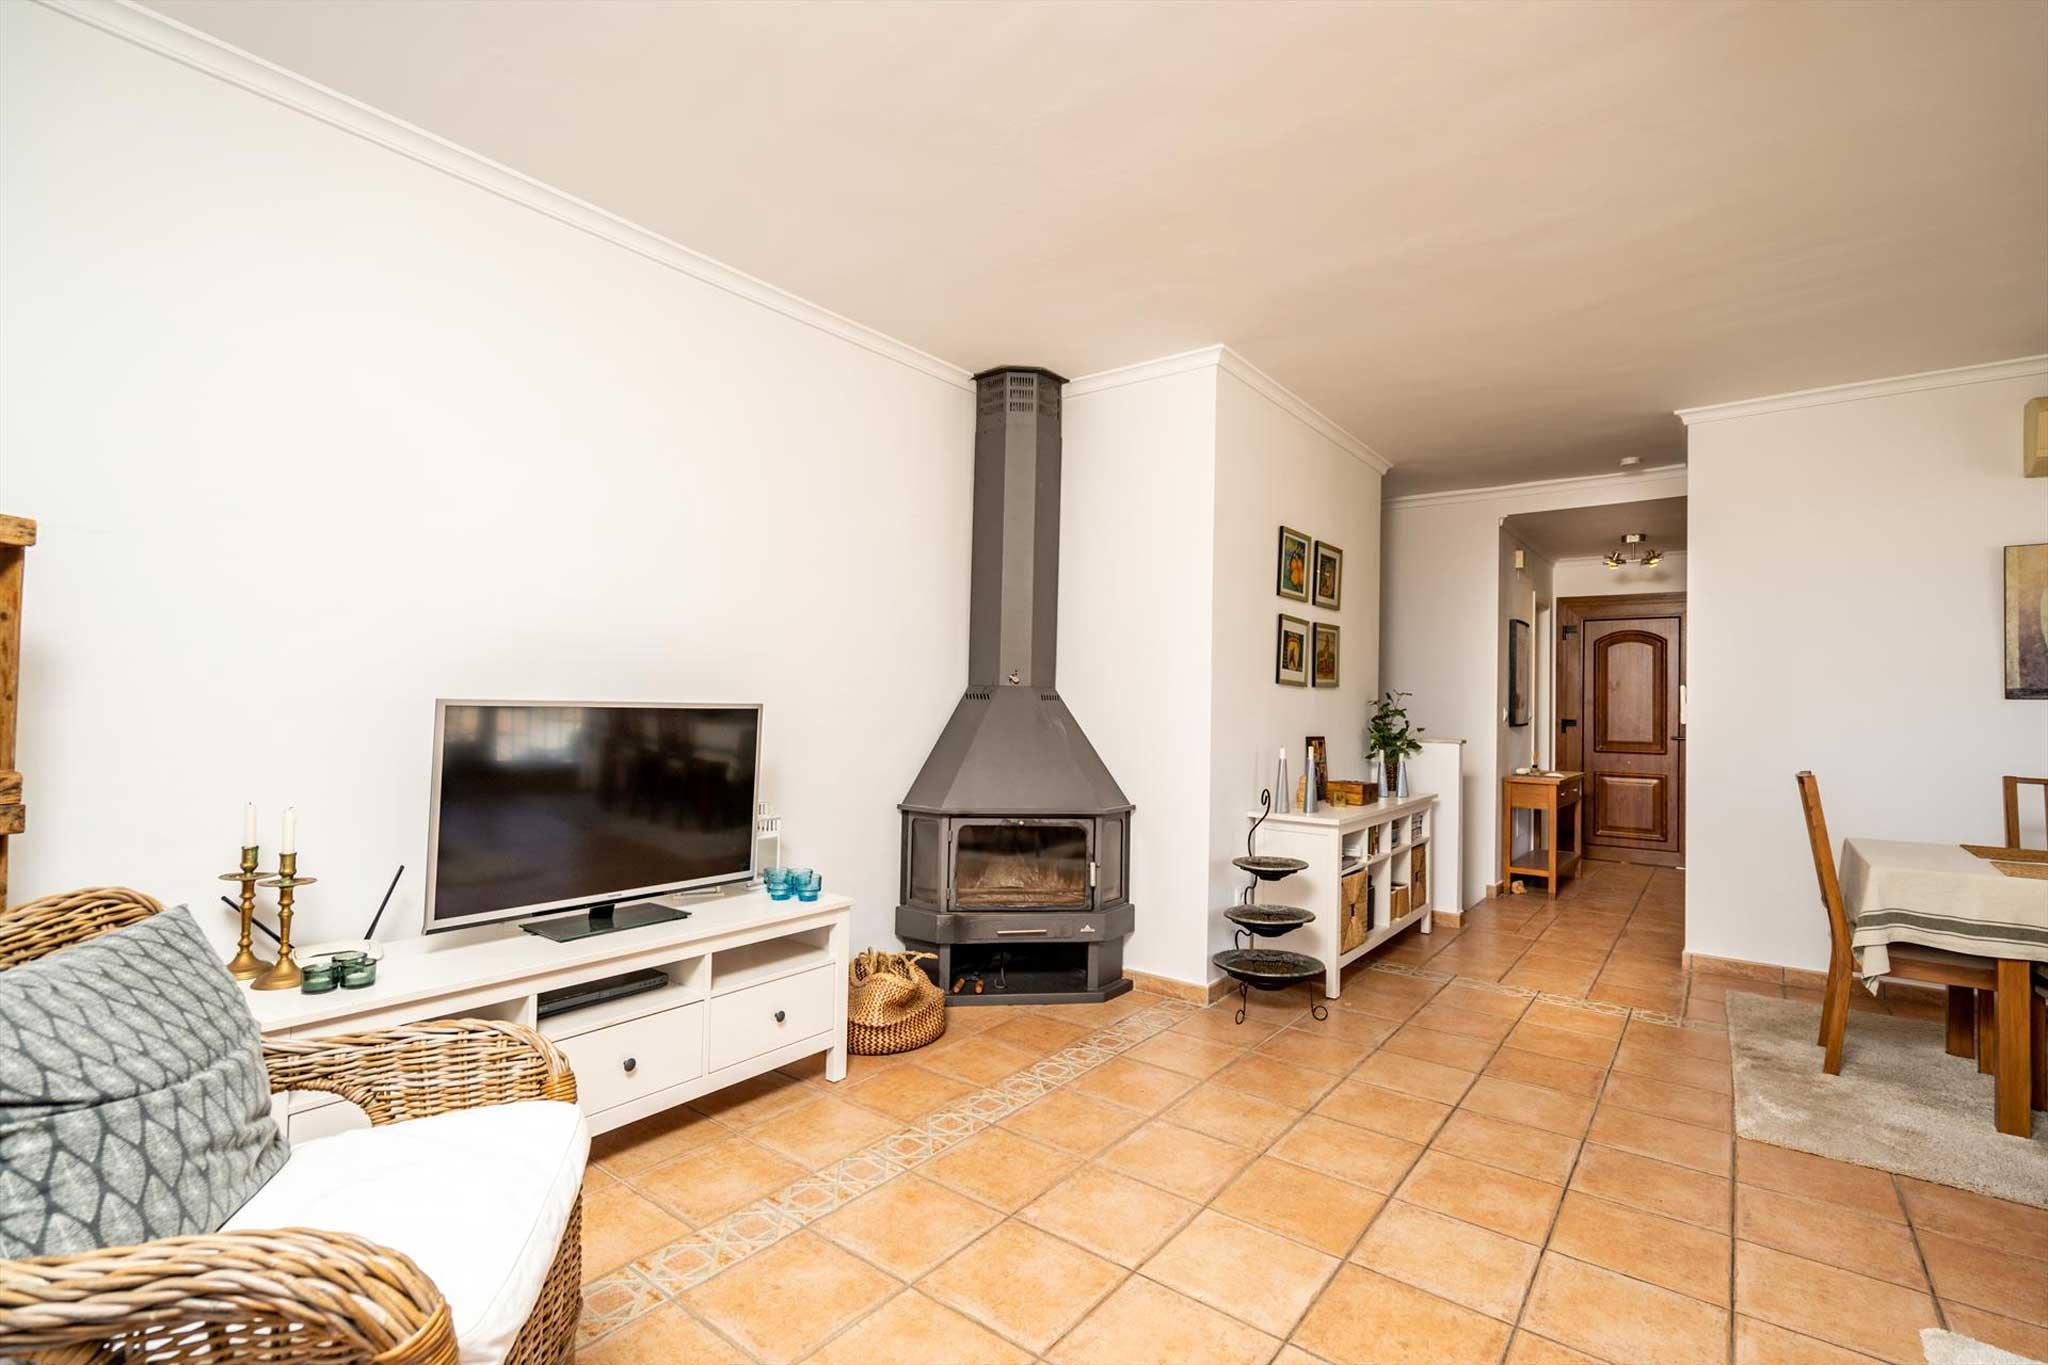 Inmobiliaria Denia alquiler vacacional – Quality Rent a Villa